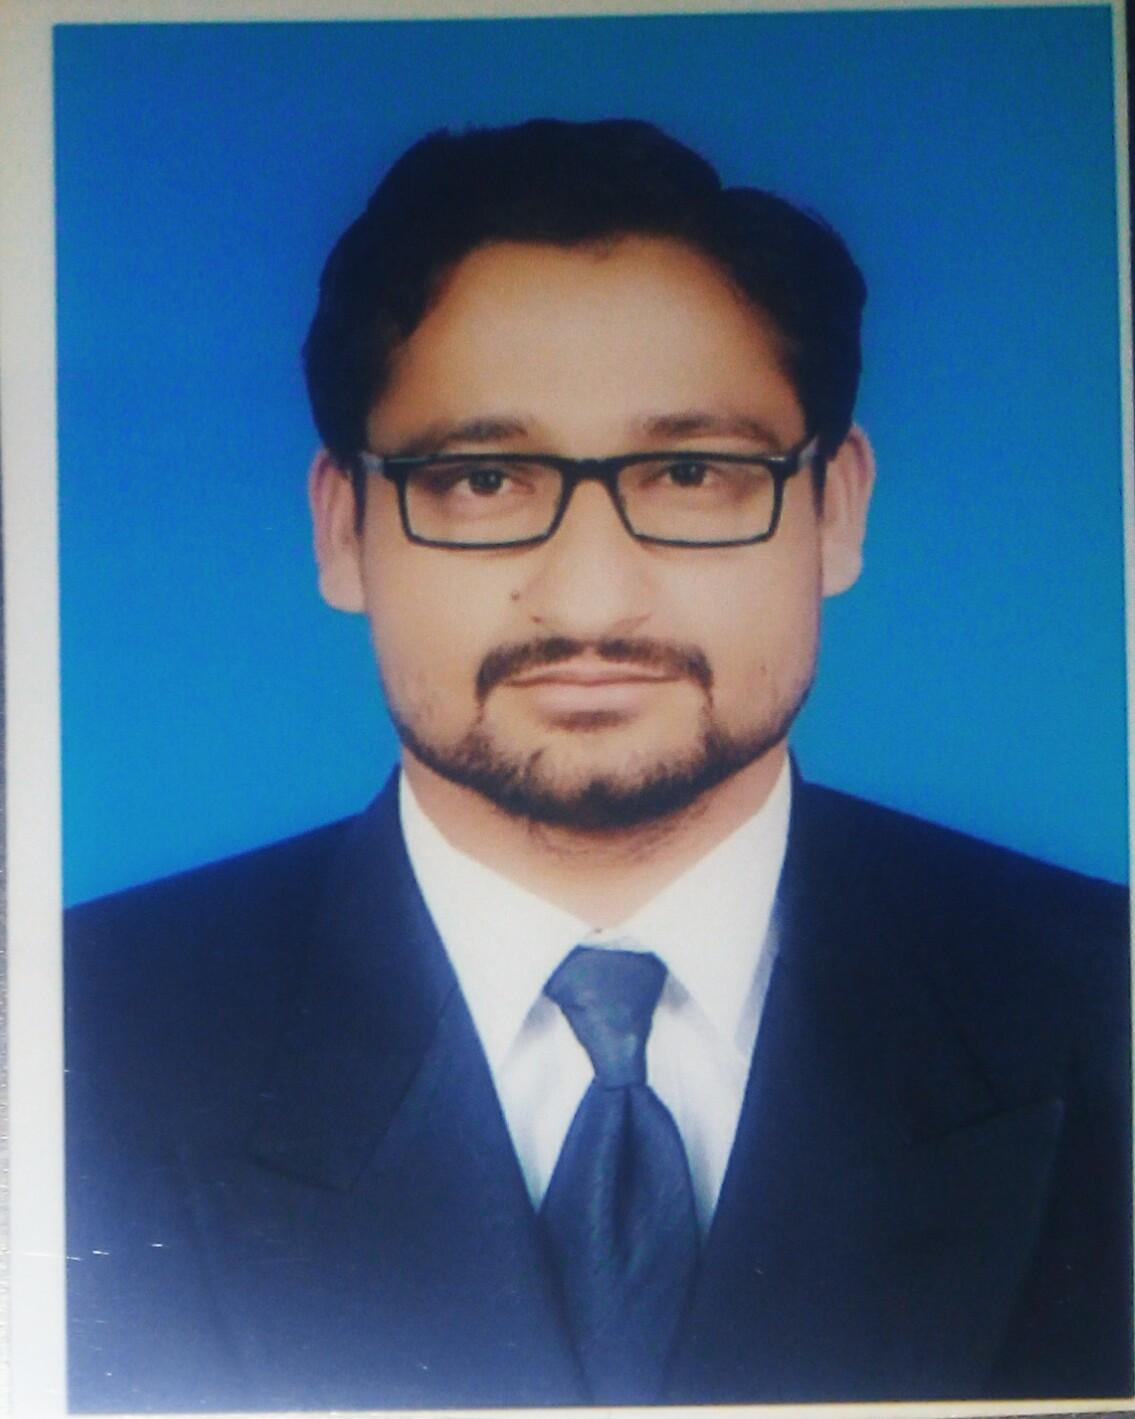 Mazhar Hussain OCR